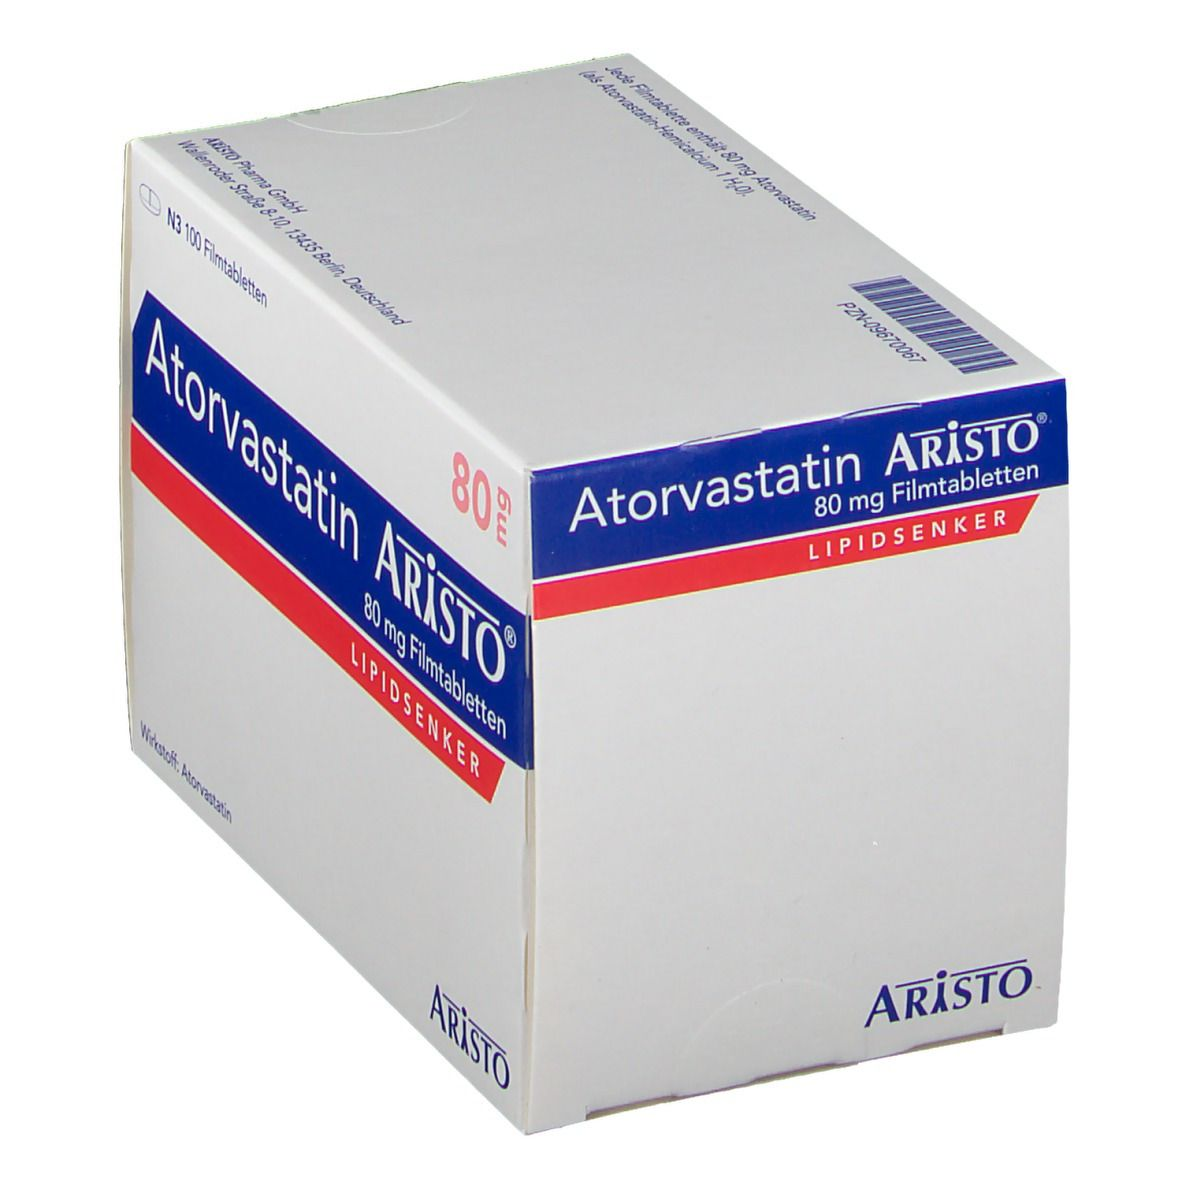 ATORVASTATIN Aristo 80 mg Filmtabletten